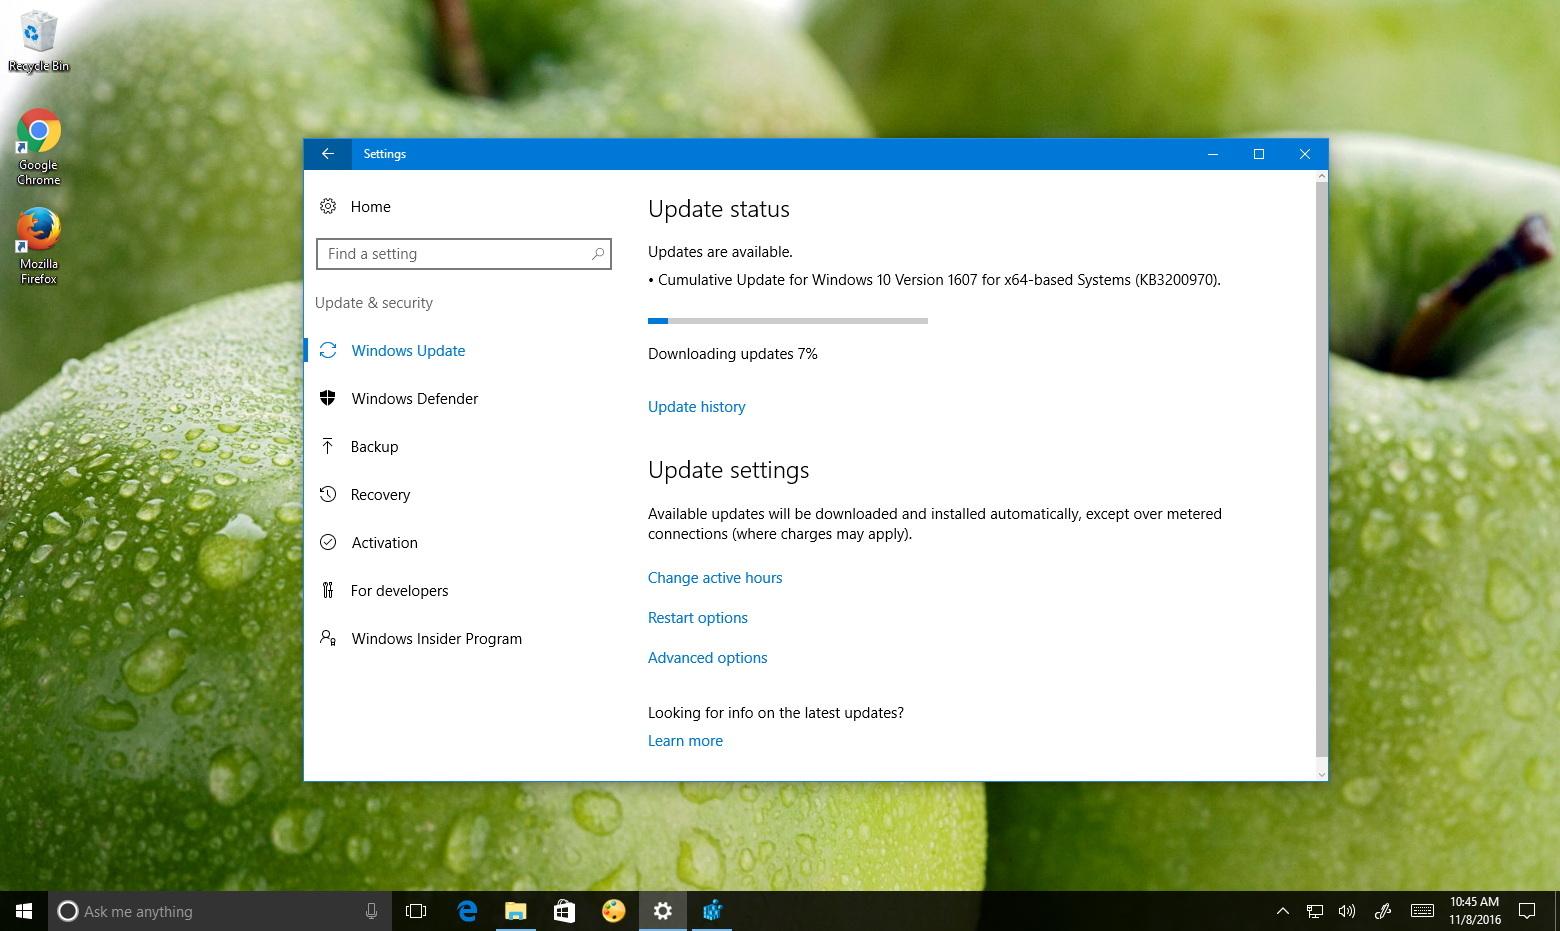 kb3200970 update for Windows 10